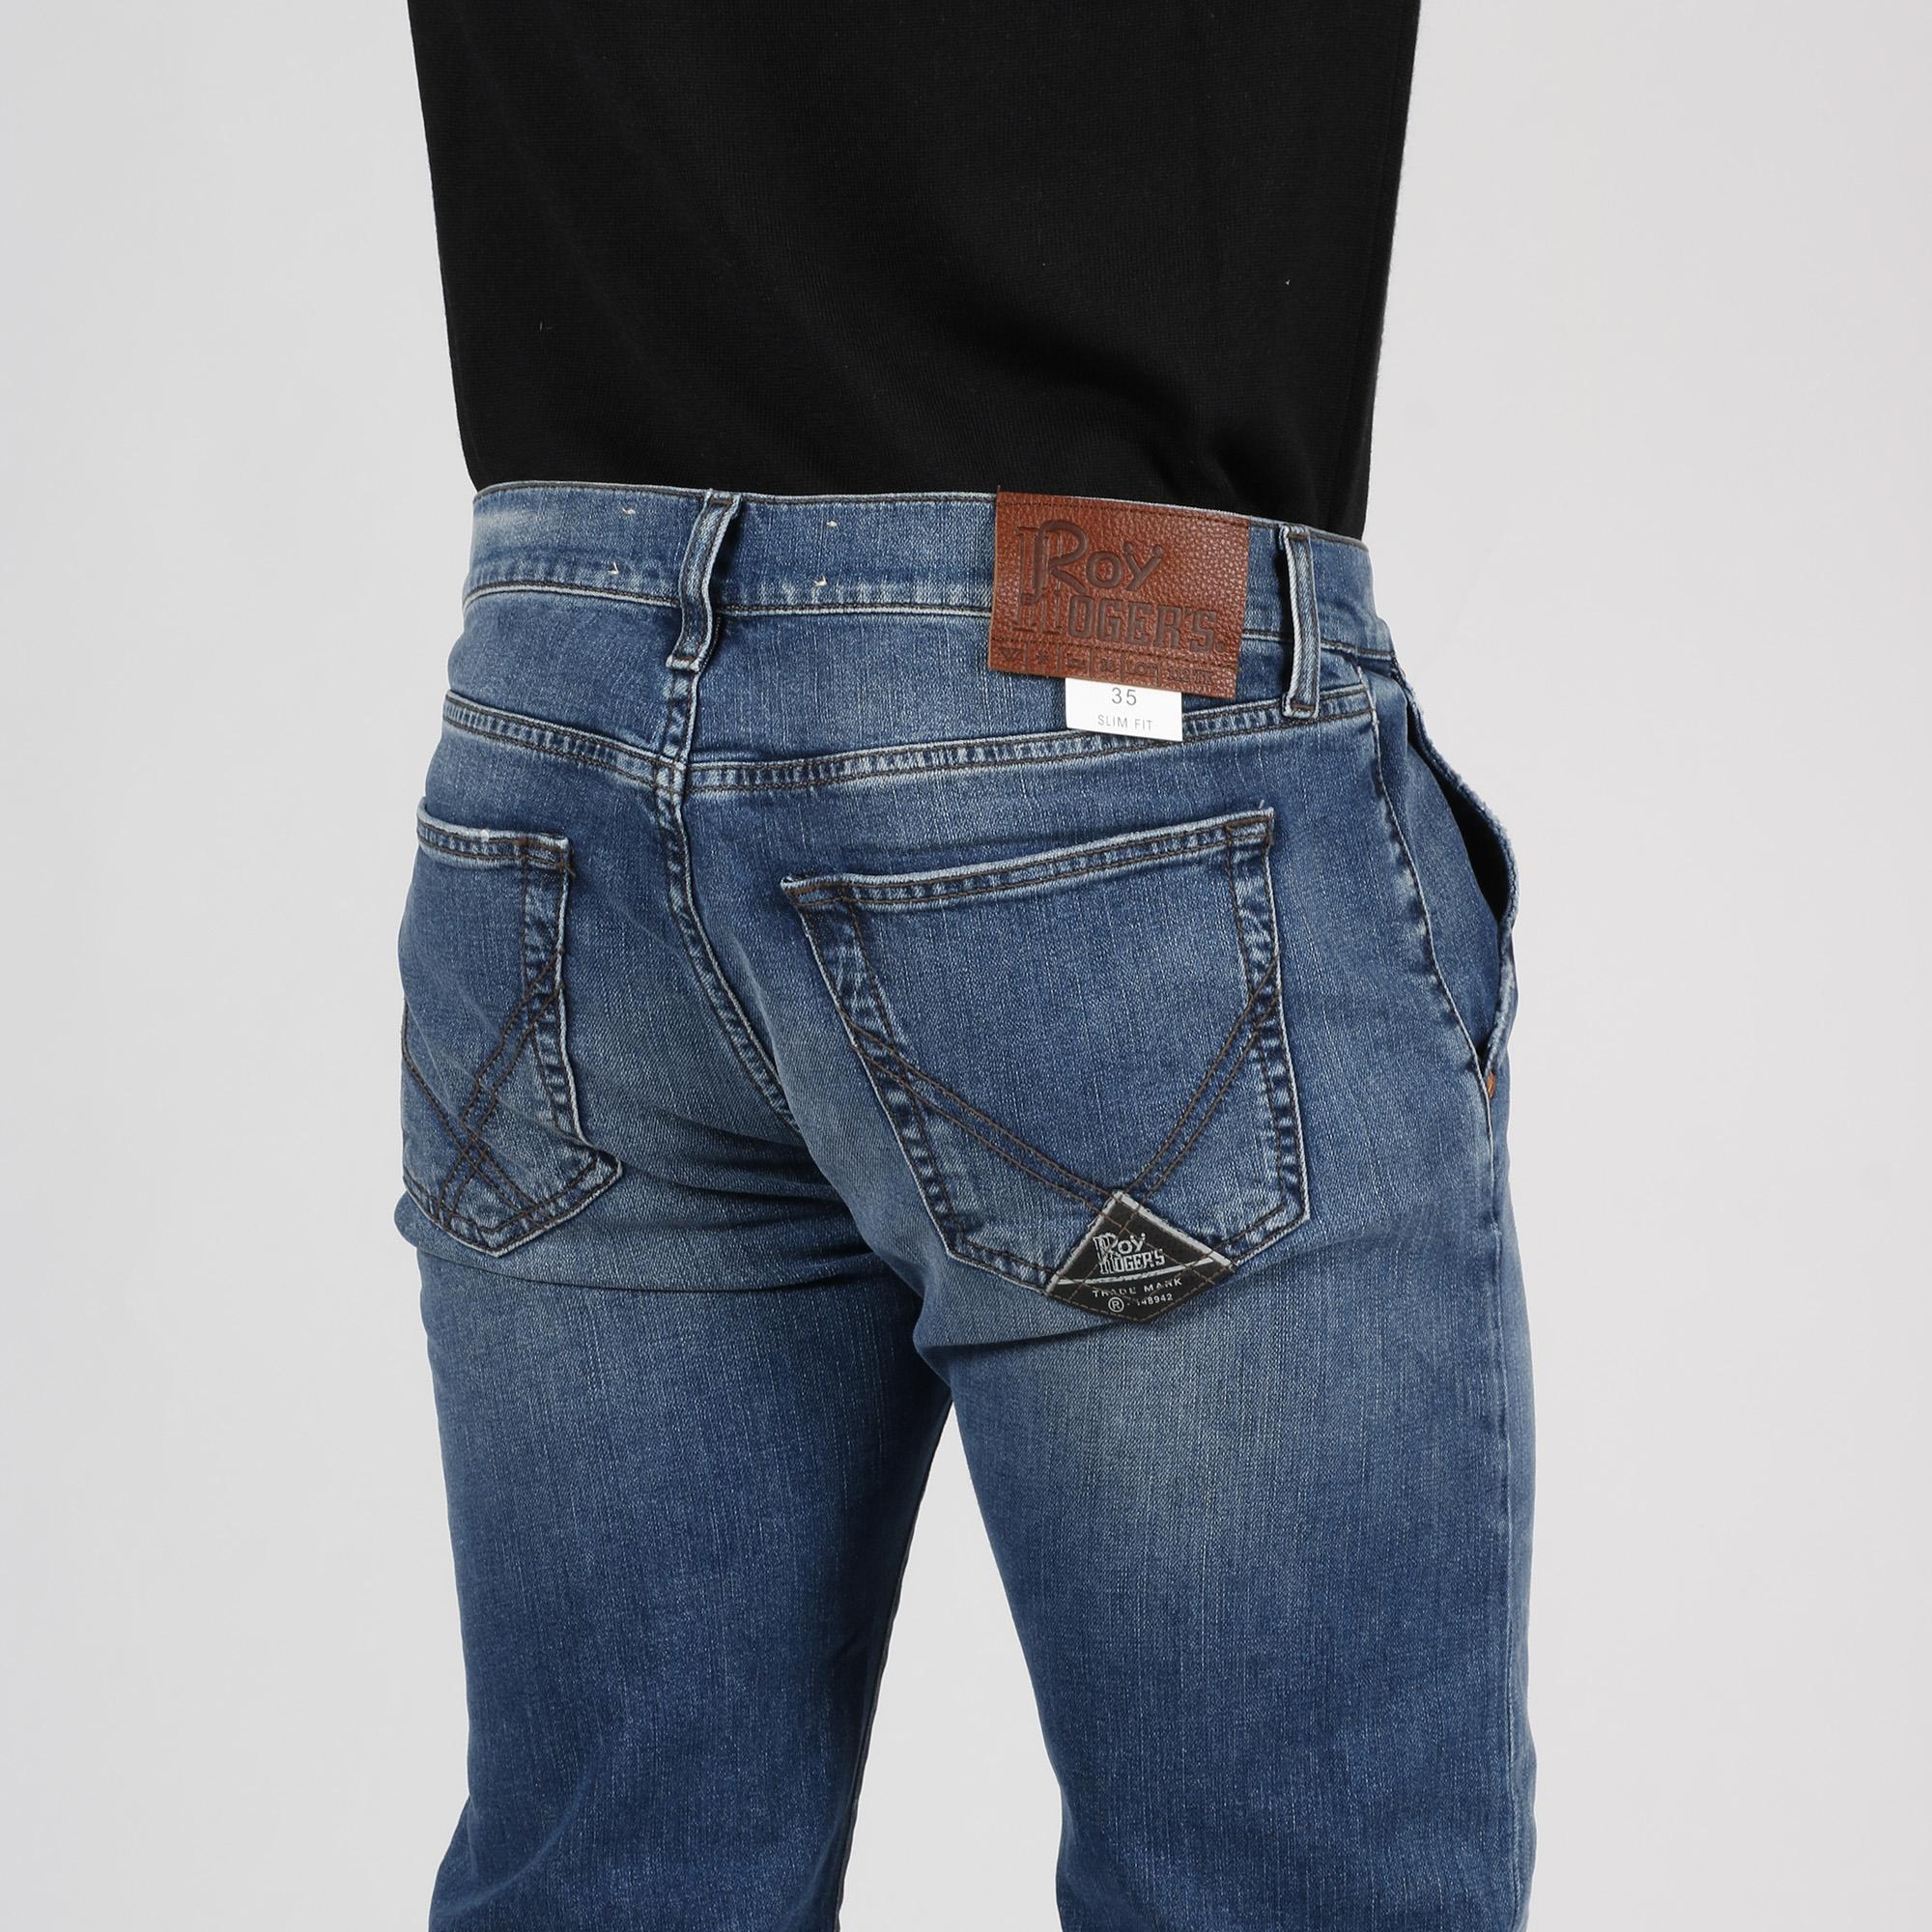 Jeans elias saba - Denim chiaro